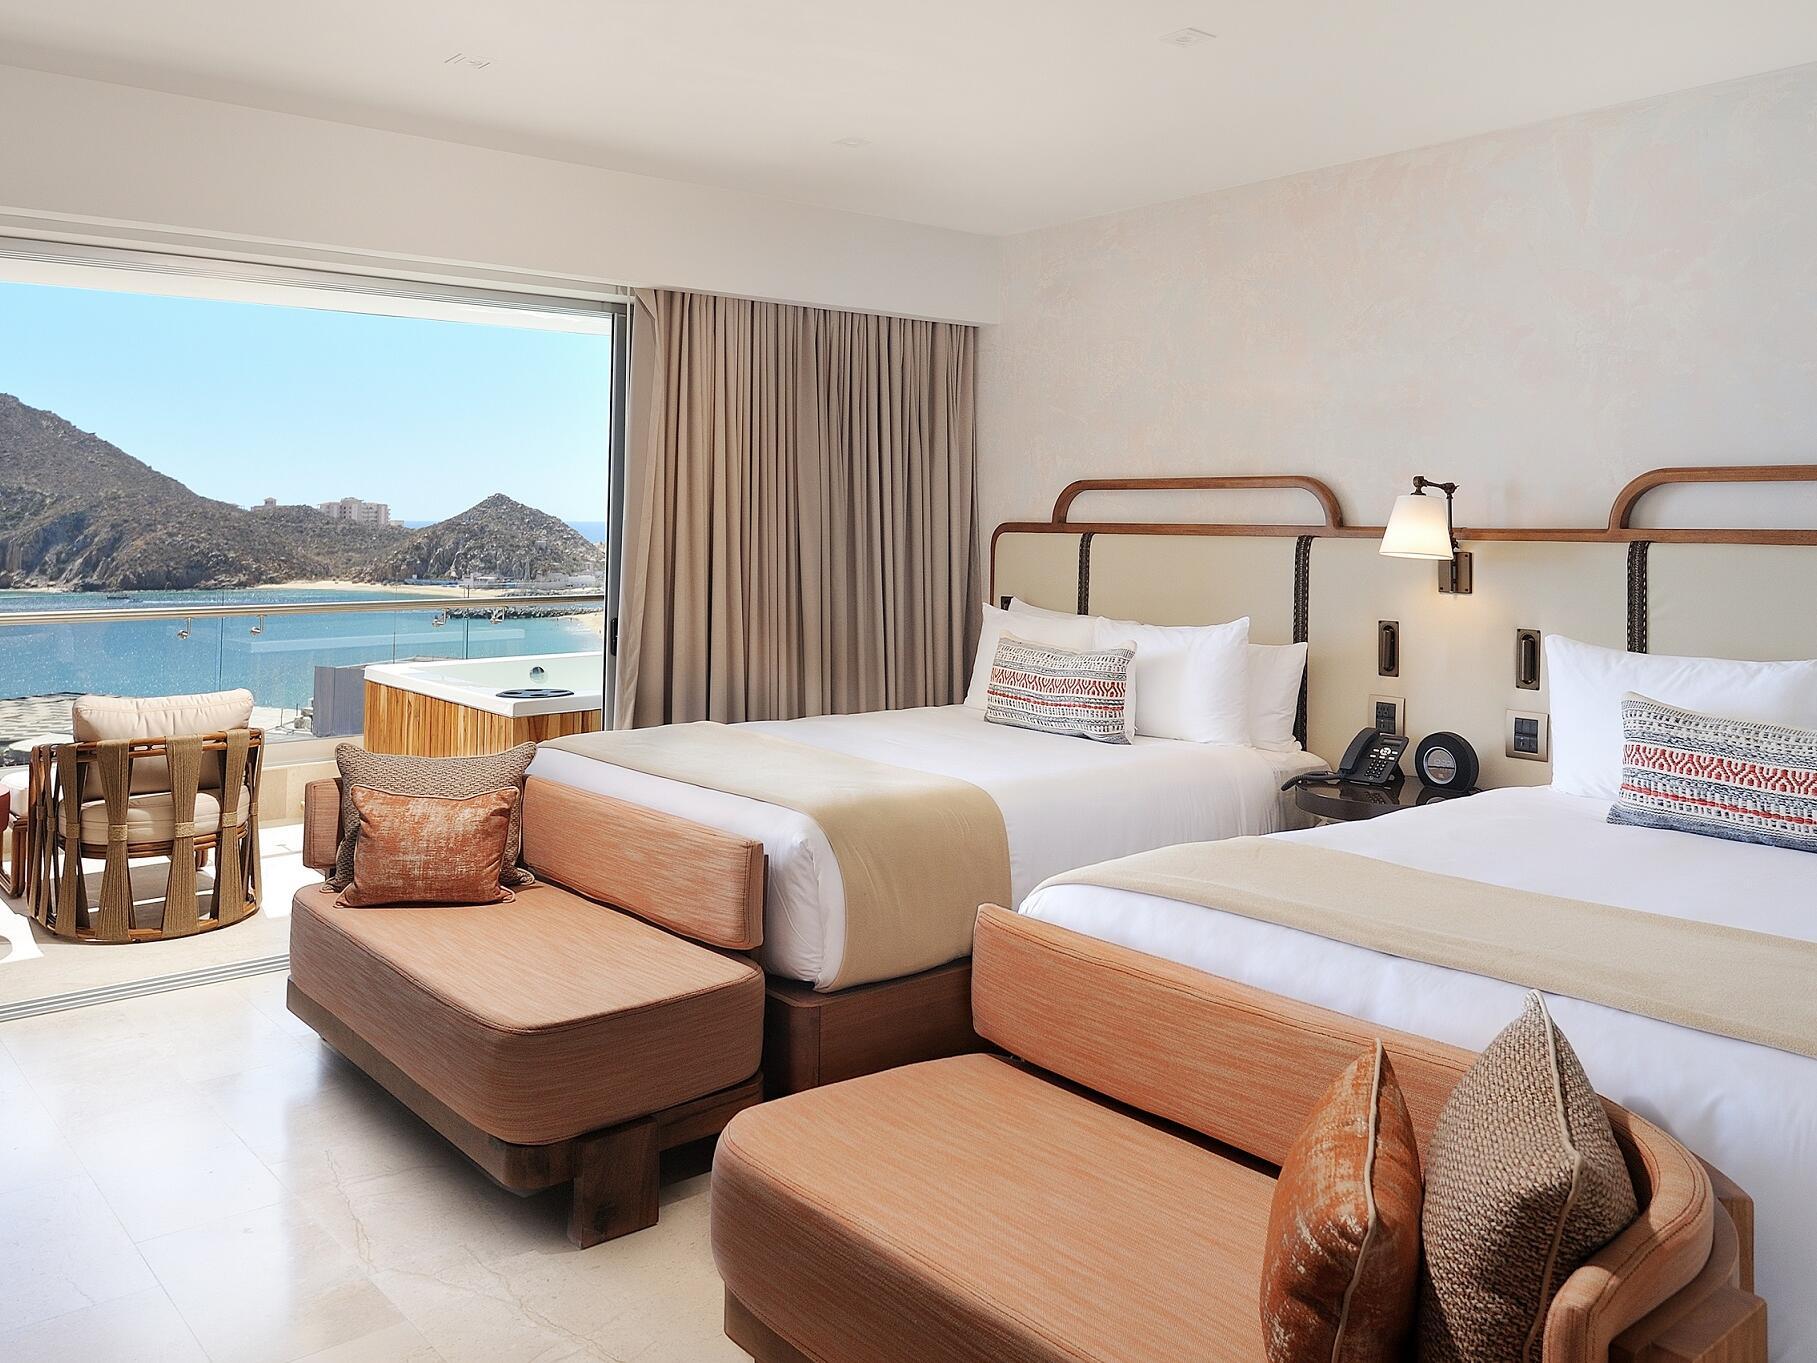 Infinity Two Queens Suite bedroom at Cabo villas beach resort